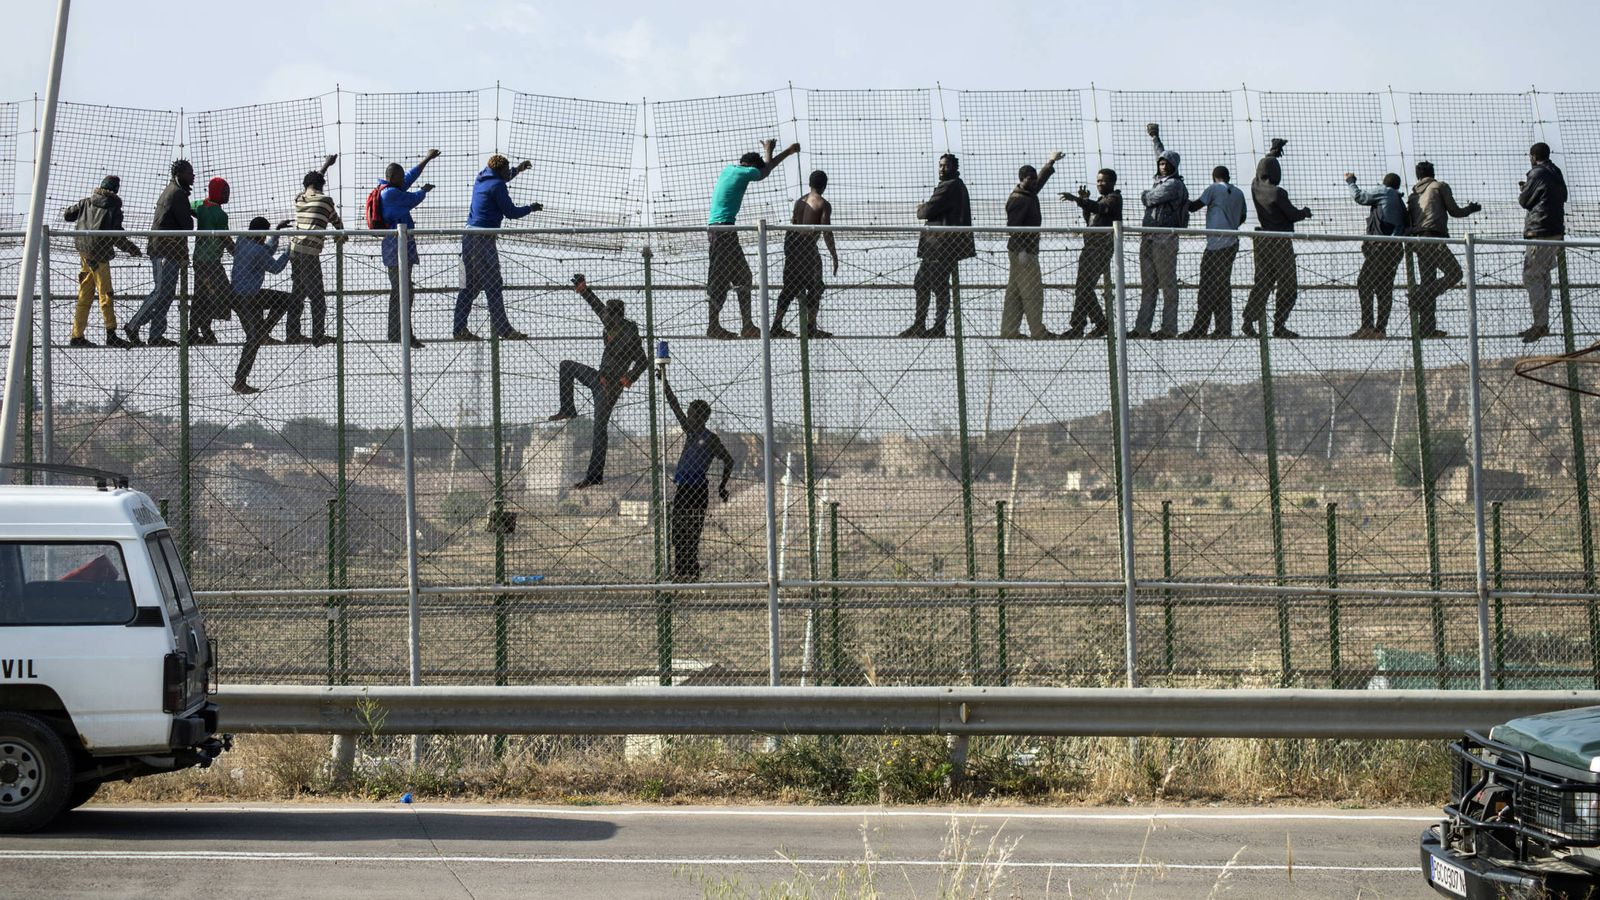 Marruecos Amenaza Con Reabrir El Grifo De La Emigraci 243 N A